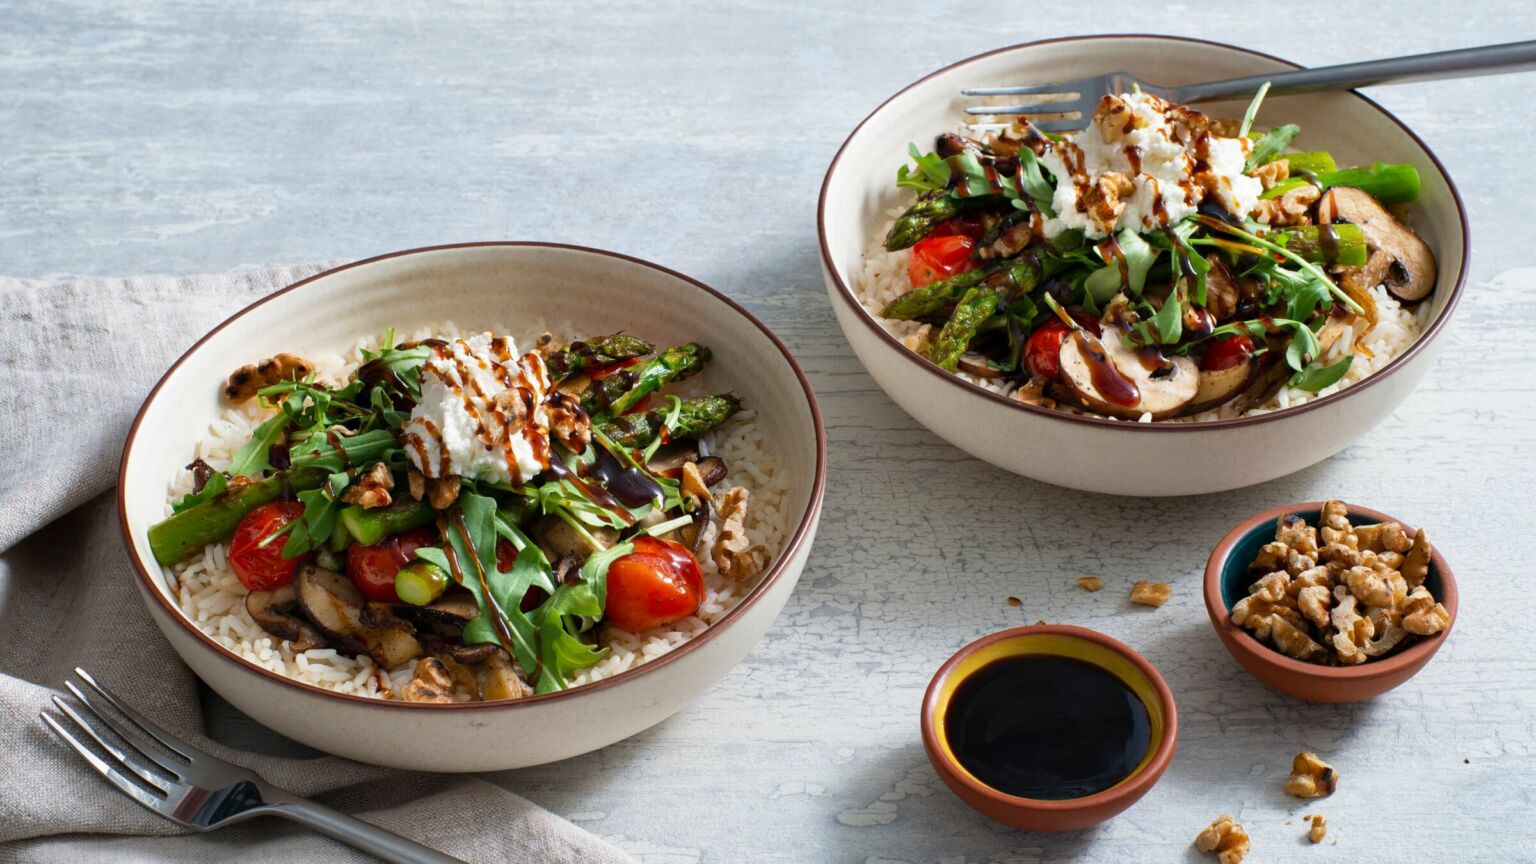 Roasted Asparagus and Mushroom Rice Bowl